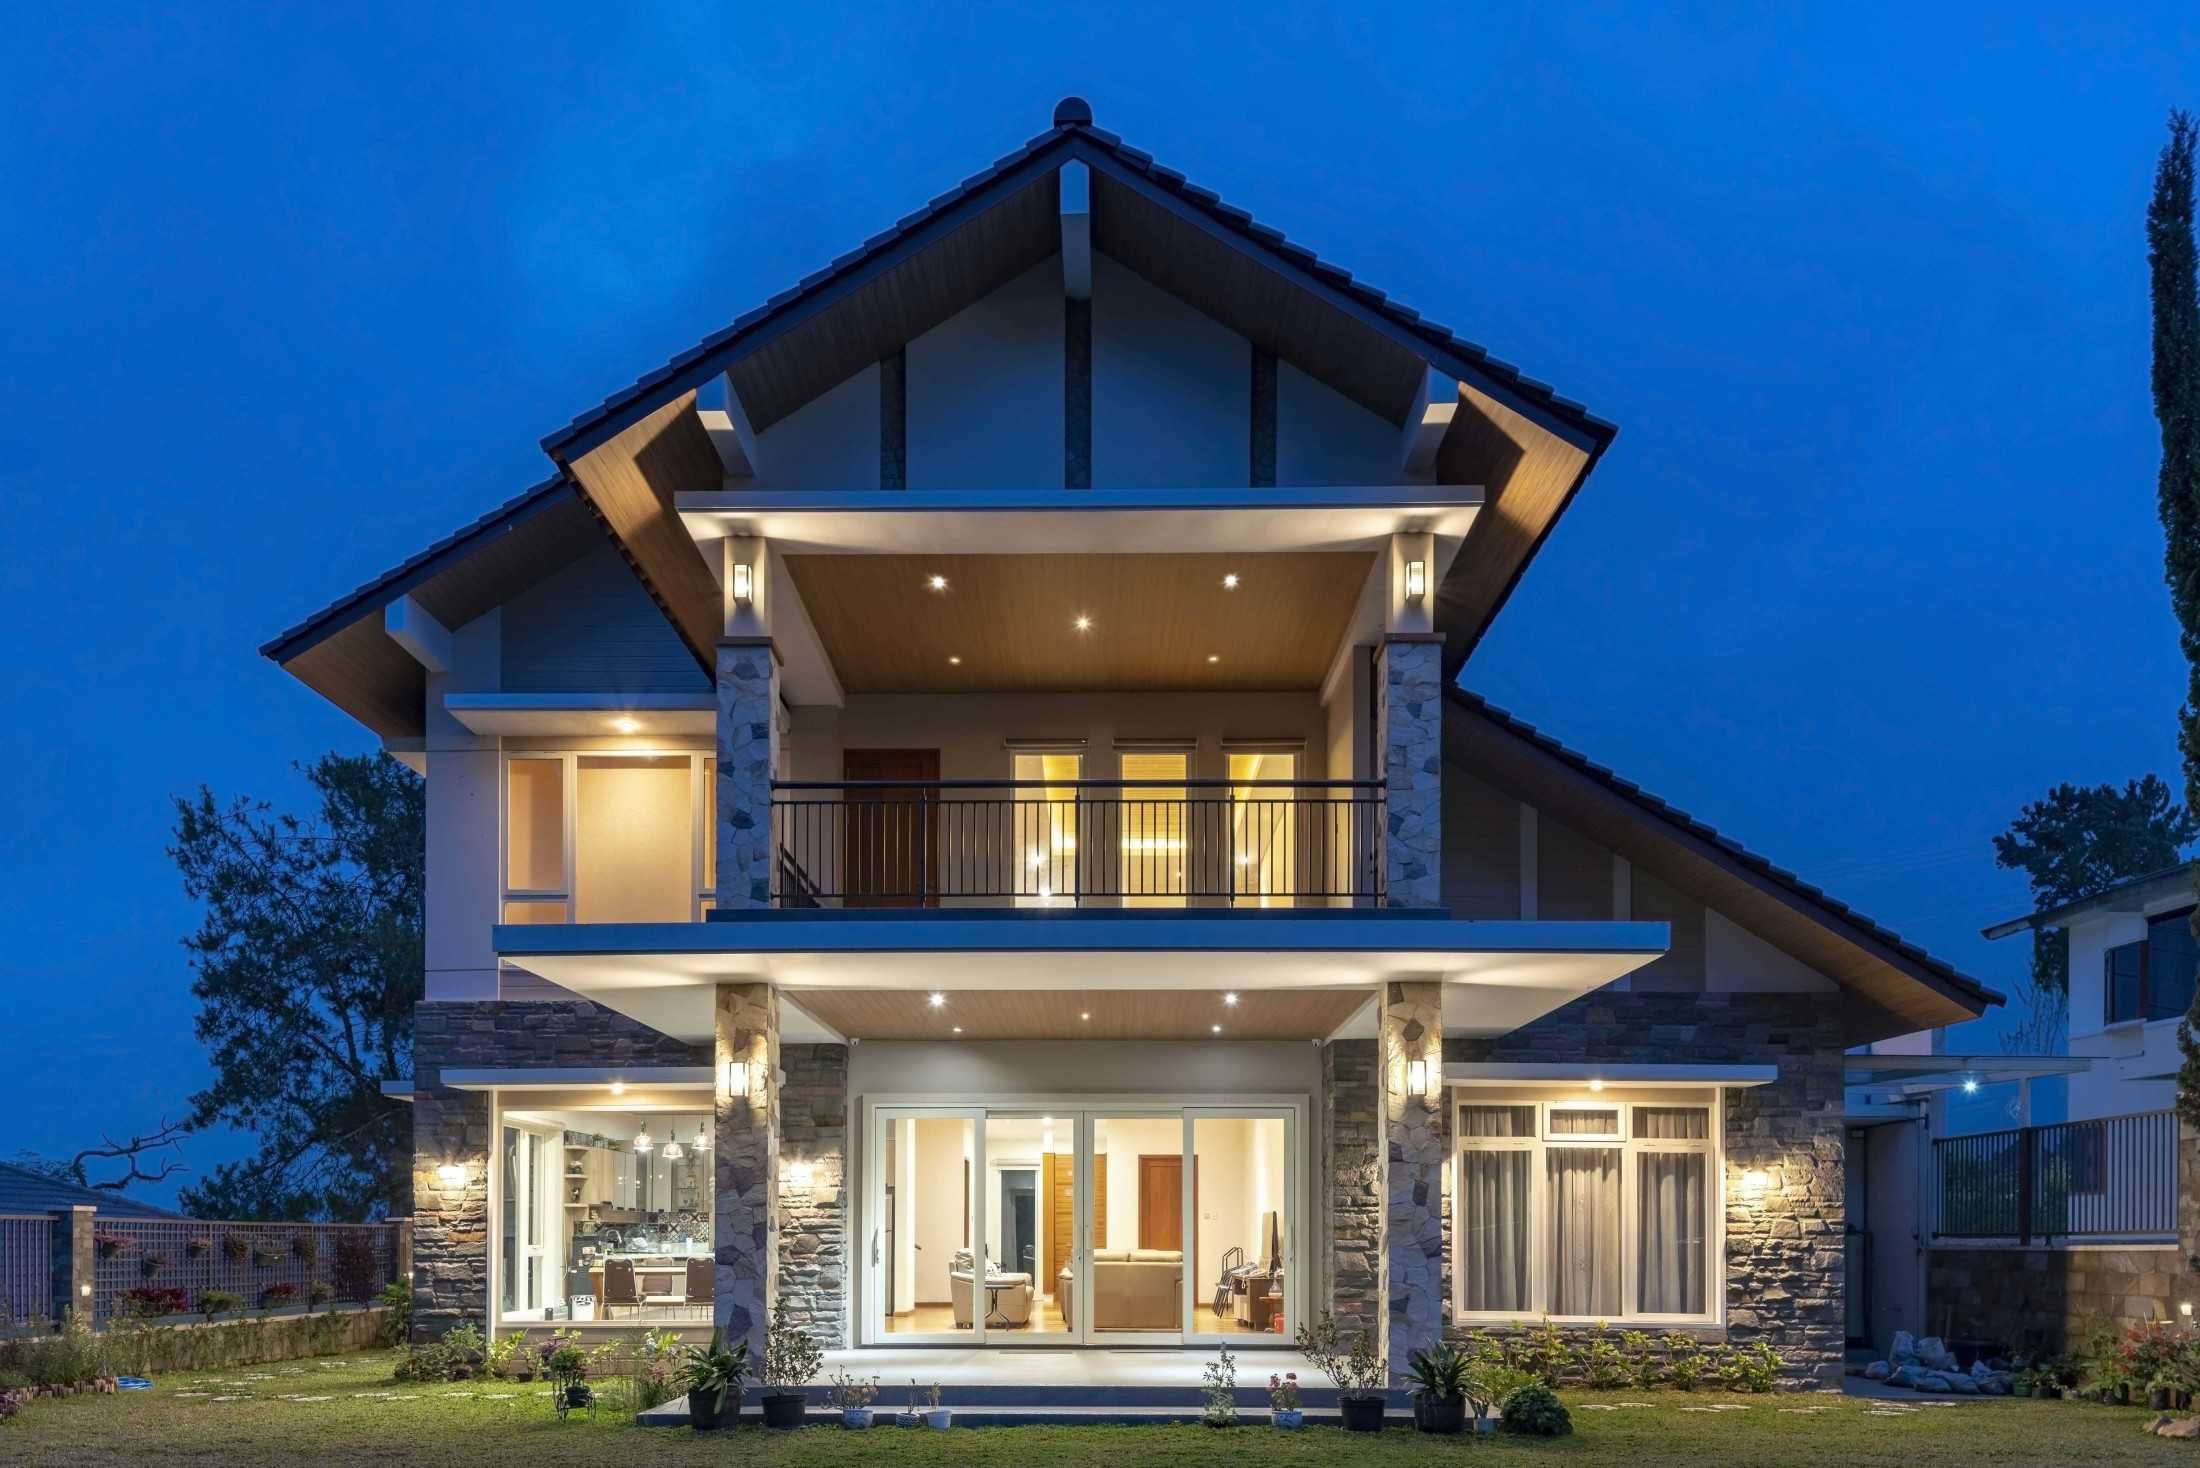 Conarch Studio Breezy Tropical Villa Kec. Tawangmangu, Kabupaten Karanganyar, Jawa Tengah, Indonesia Kec. Tawangmangu, Kabupaten Karanganyar, Jawa Tengah, Indonesia Facade  126661